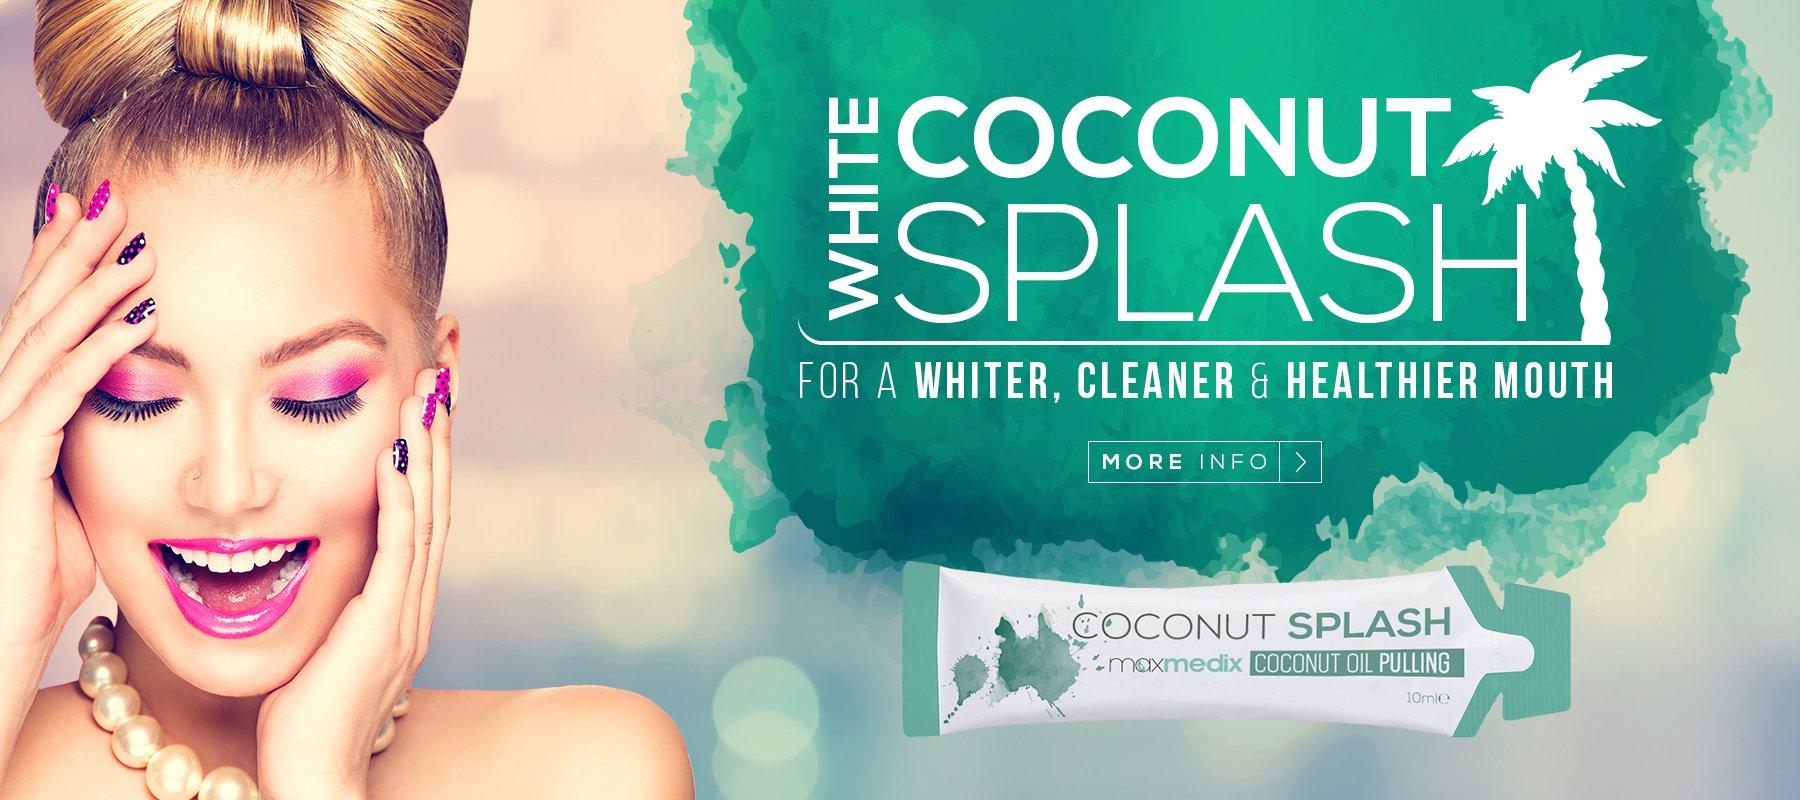 Coconut Splash 2018